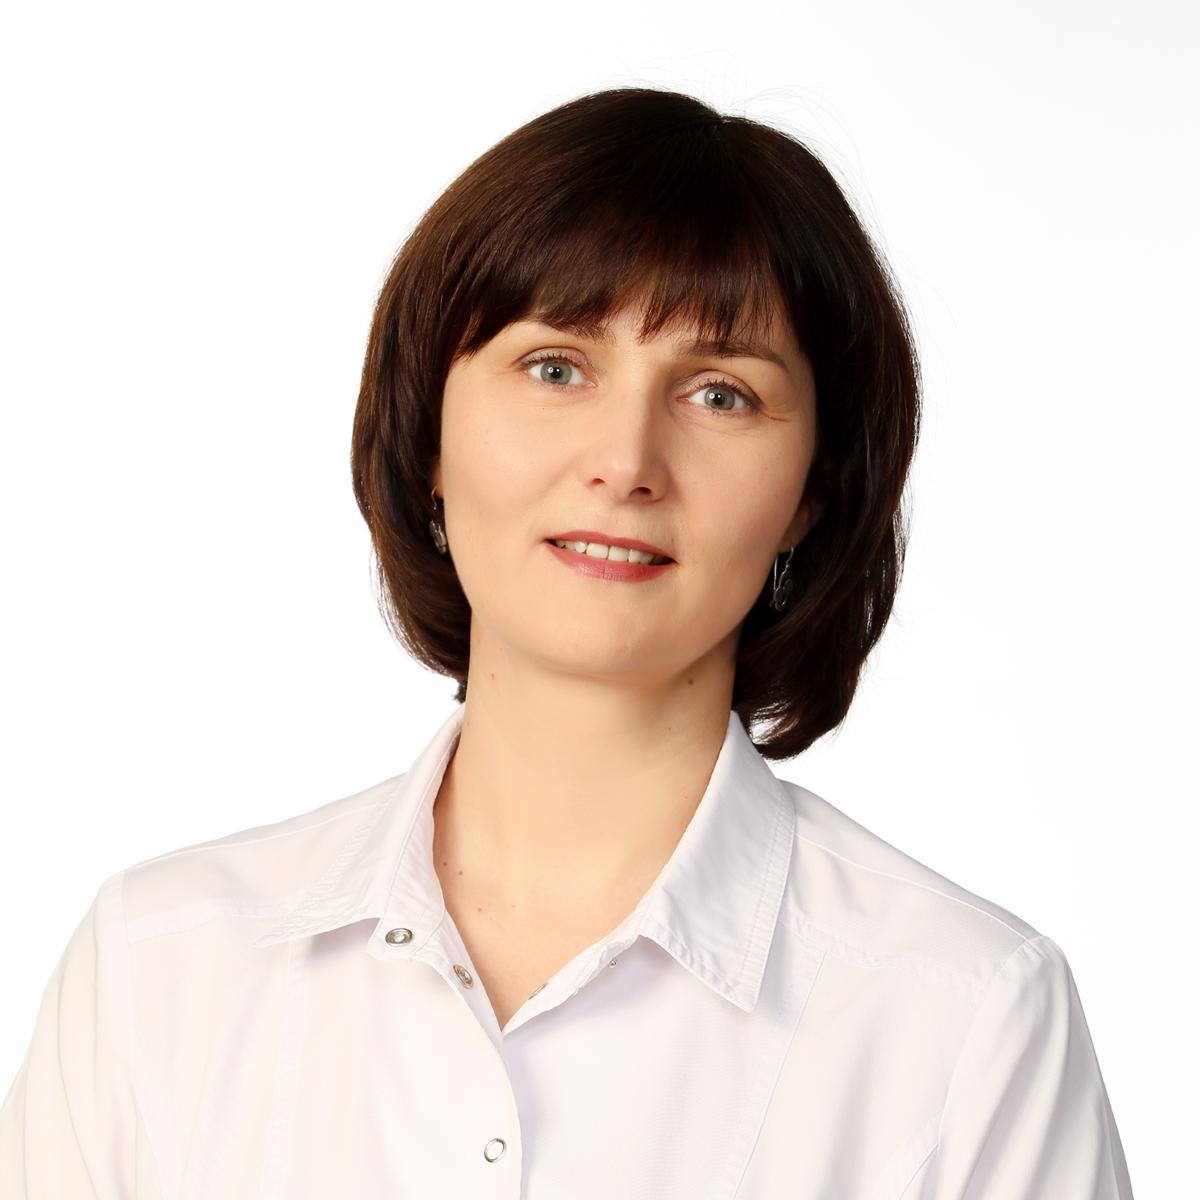 Веснина Ольга Геннадьевна